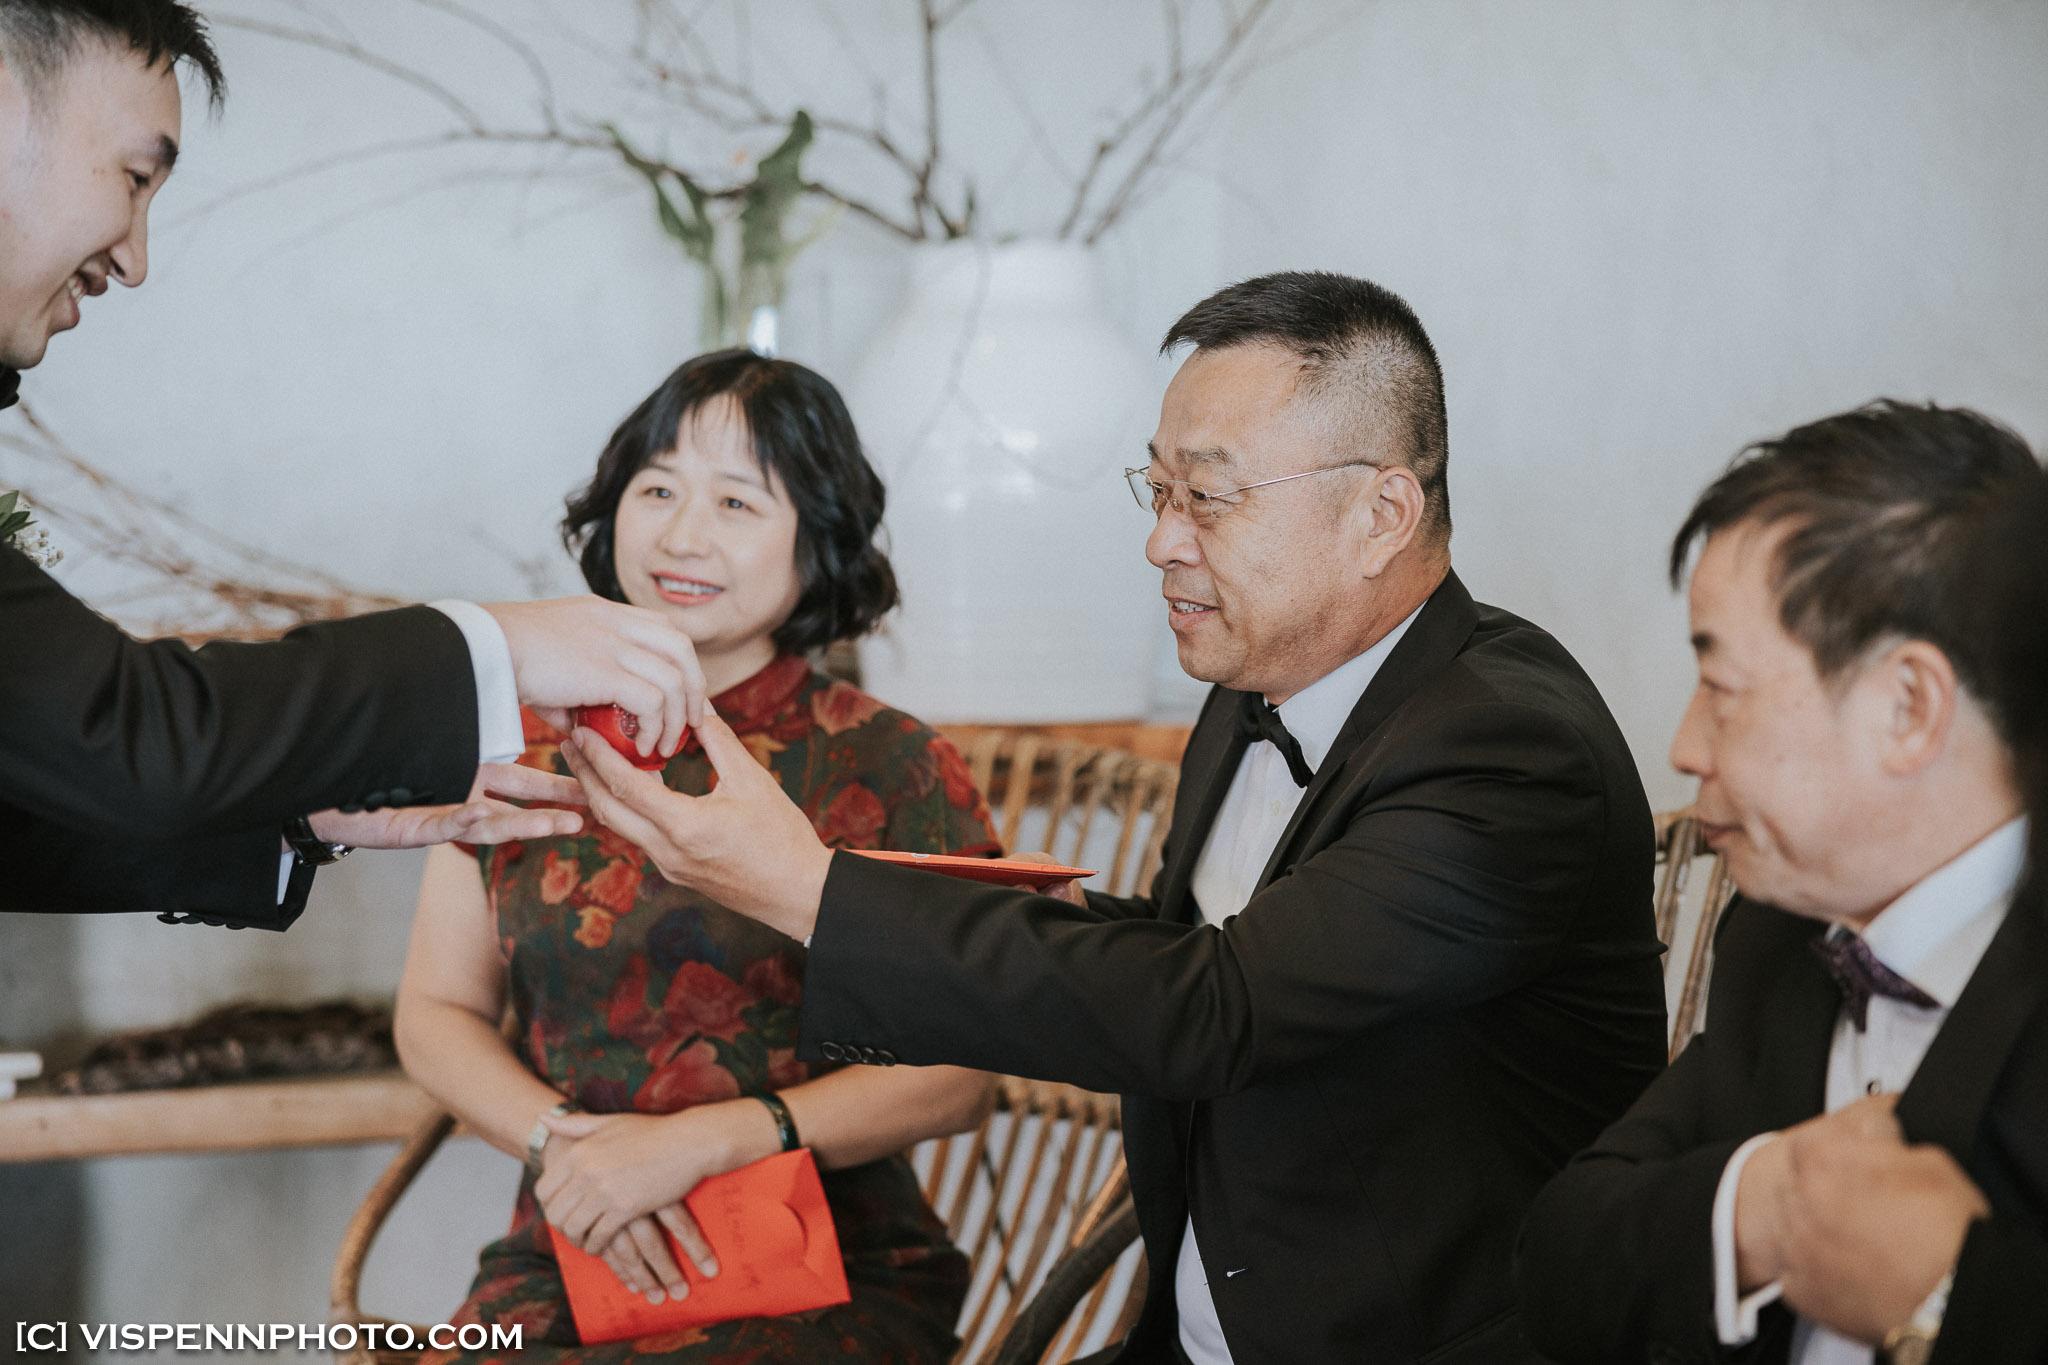 WEDDING DAY Photography Melbourne VISPENN 墨尔本 婚礼跟拍 婚礼摄像 婚礼摄影 结婚照 登记照 LeanneWesley 01518 1P EOSR VISPENN